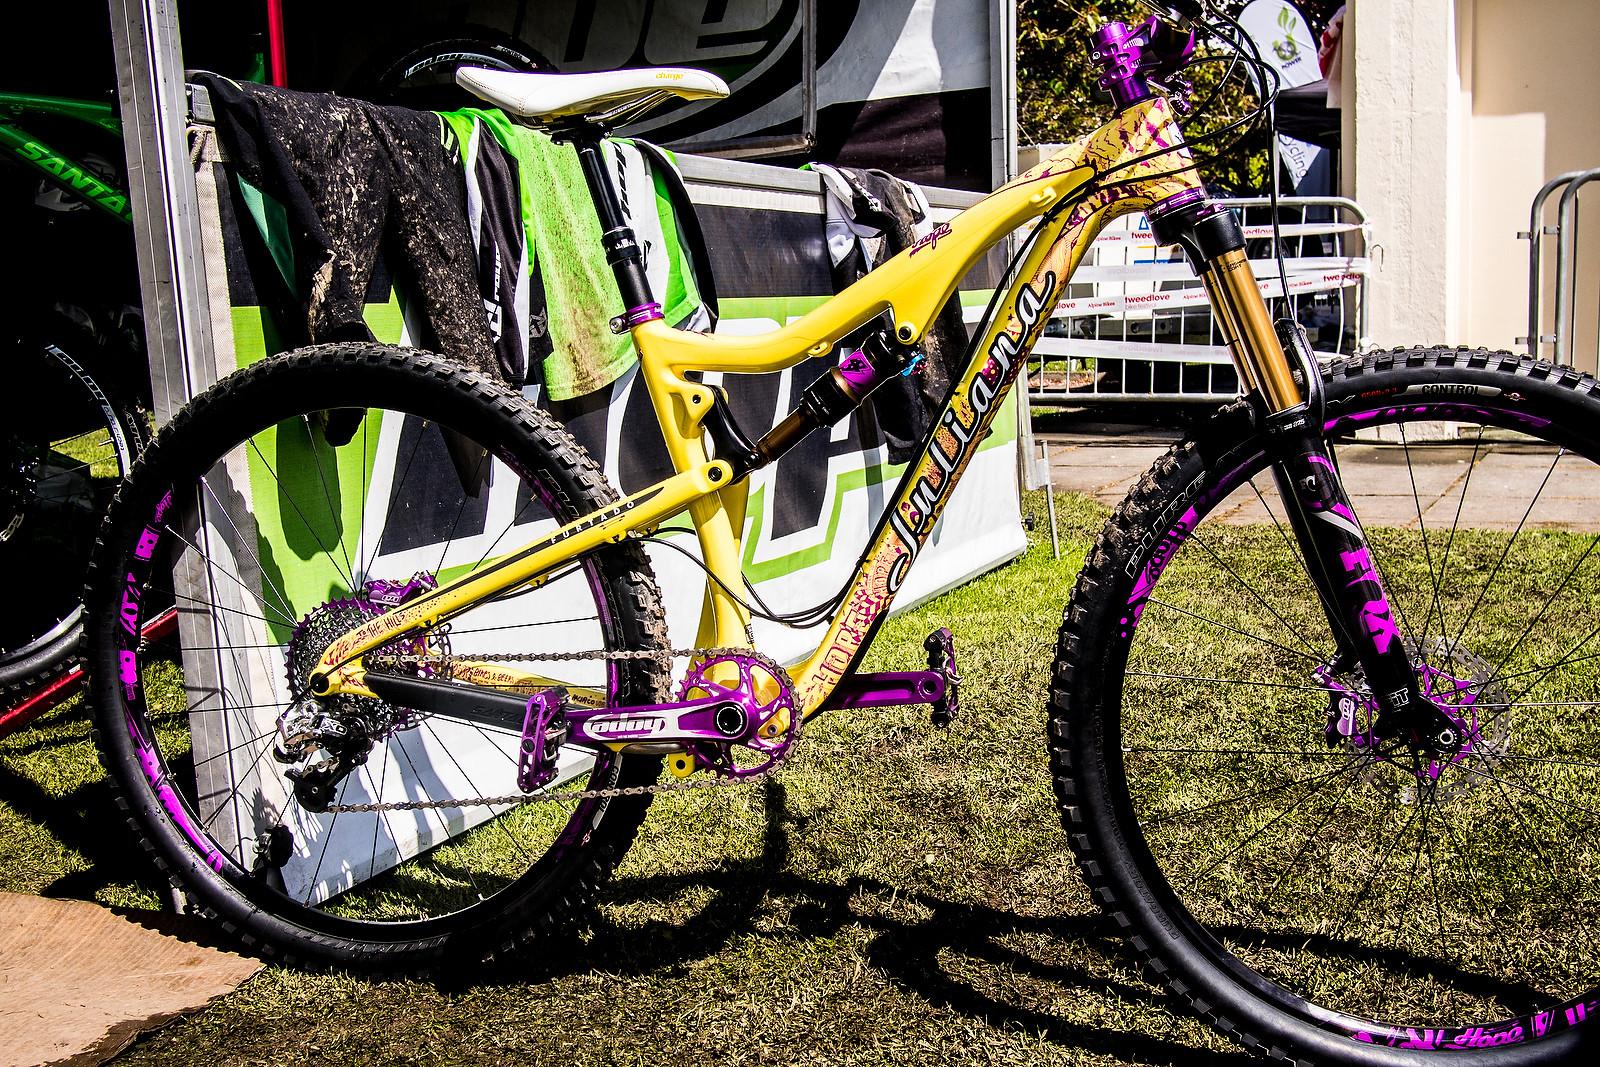 Rachel Walker's Hope'd-out Juliana - PIT BITS - Enduro World Series Tweedlove - Mountain Biking Pictures - Vital MTB